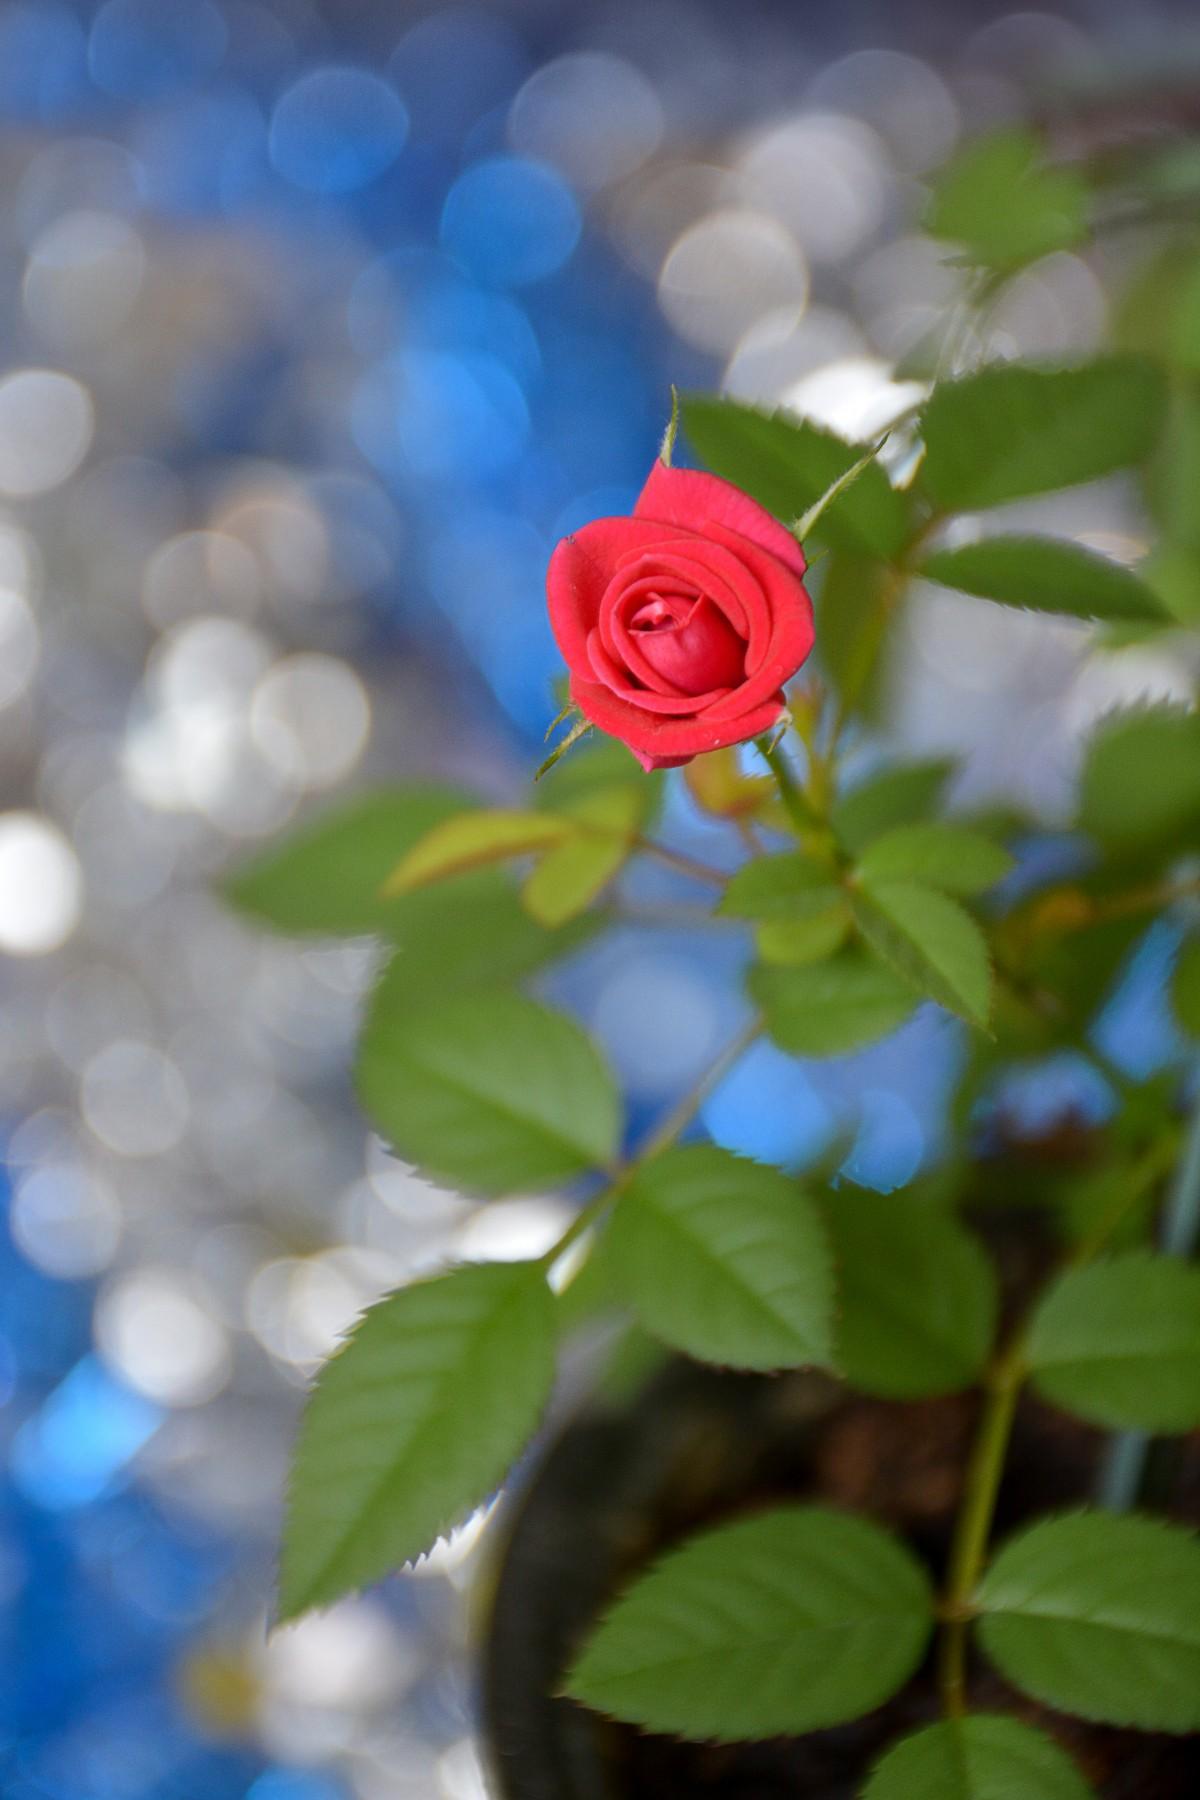 Free Images : home, flower, red, leaves, flowering plant, blue, petal, garden roses, rose family ...